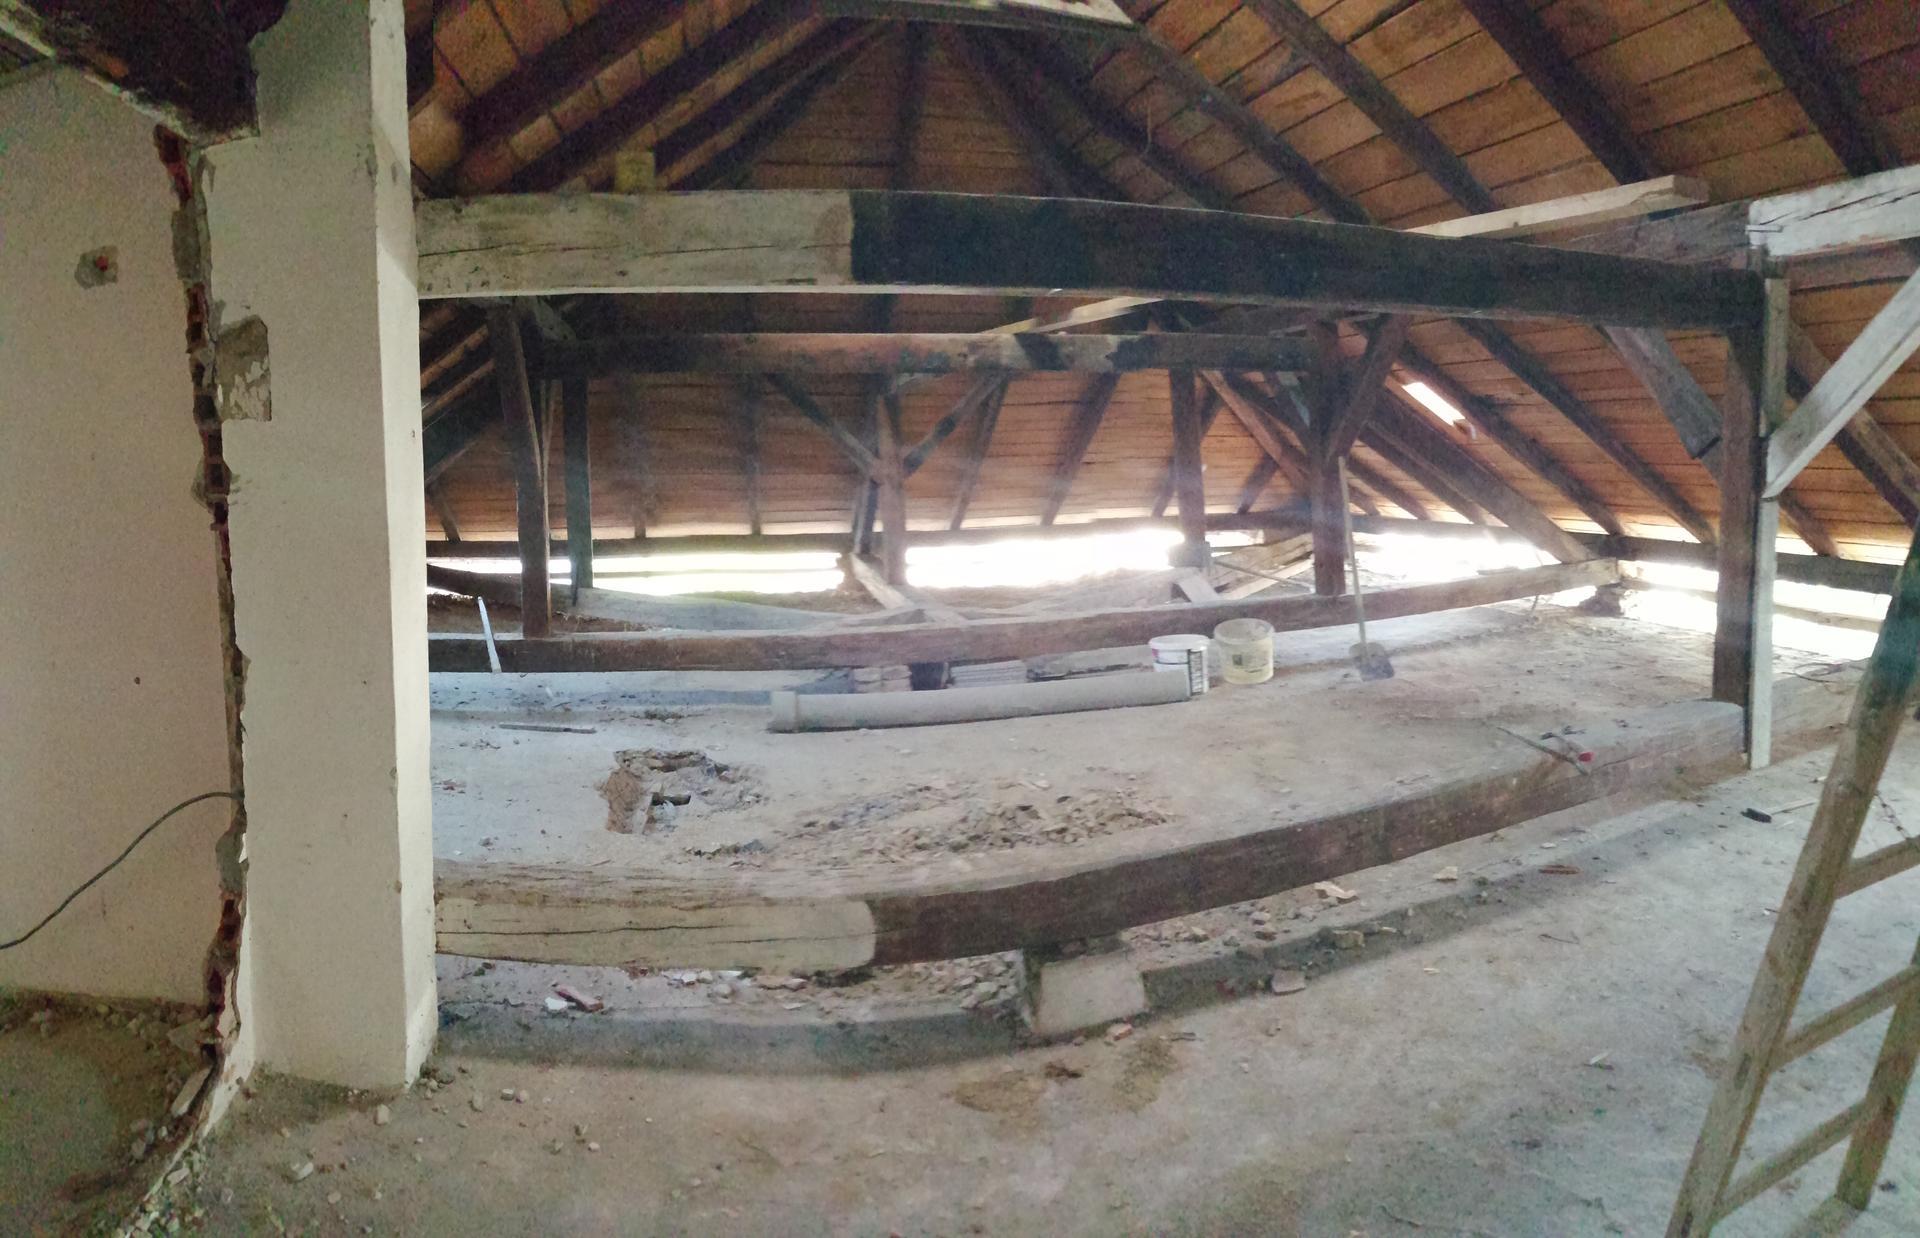 Prestavba podkrovia zo sedlovo valbovej na sedlovú strechu. - Obrázok č. 47